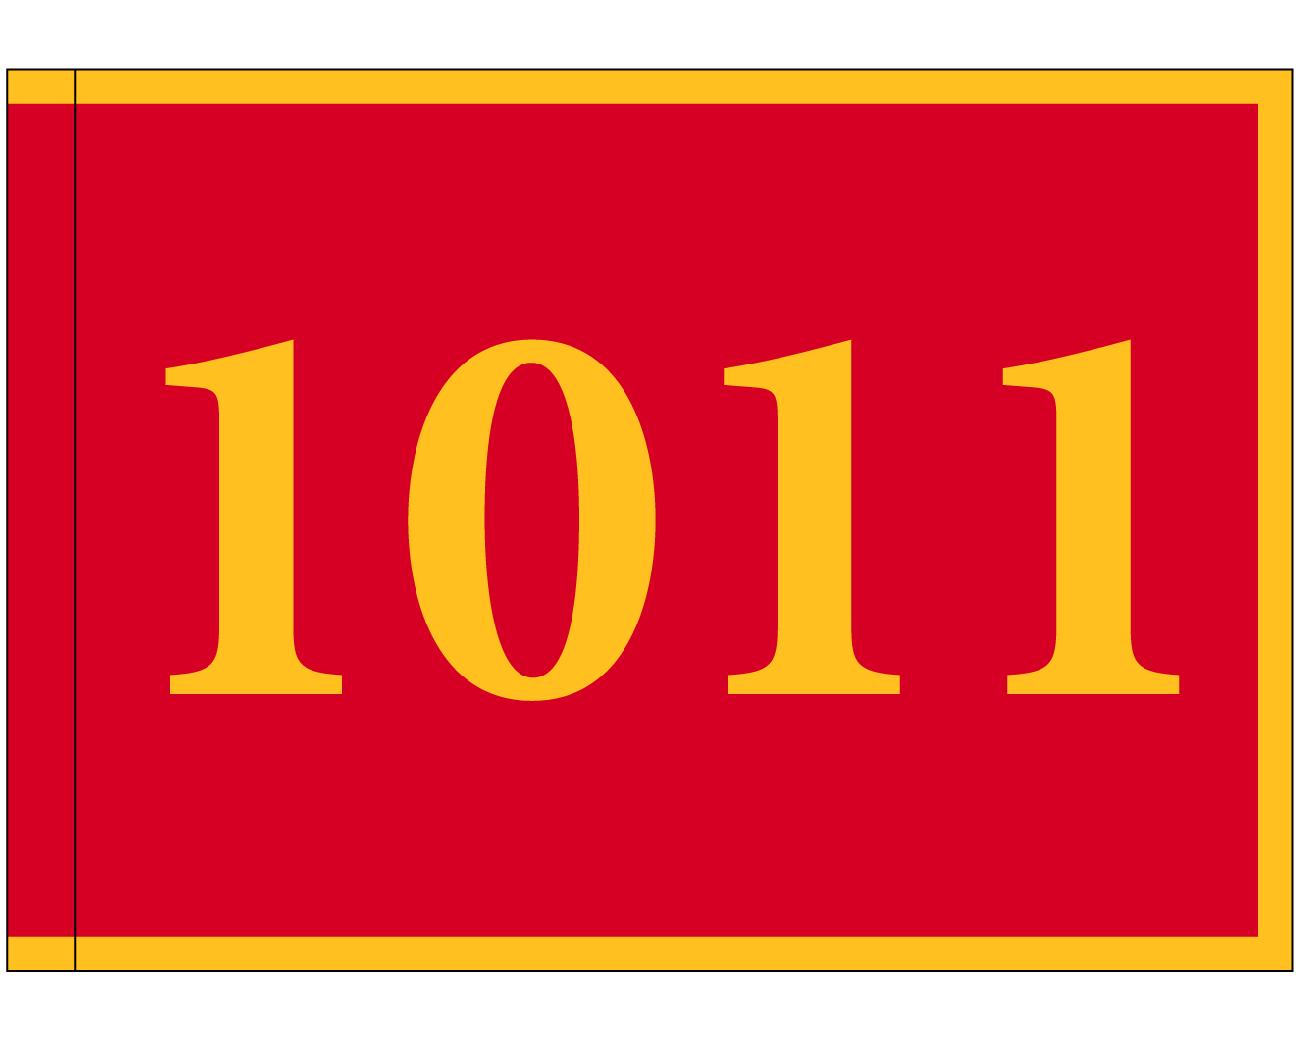 Marine Corps Flags & USMC Accessories